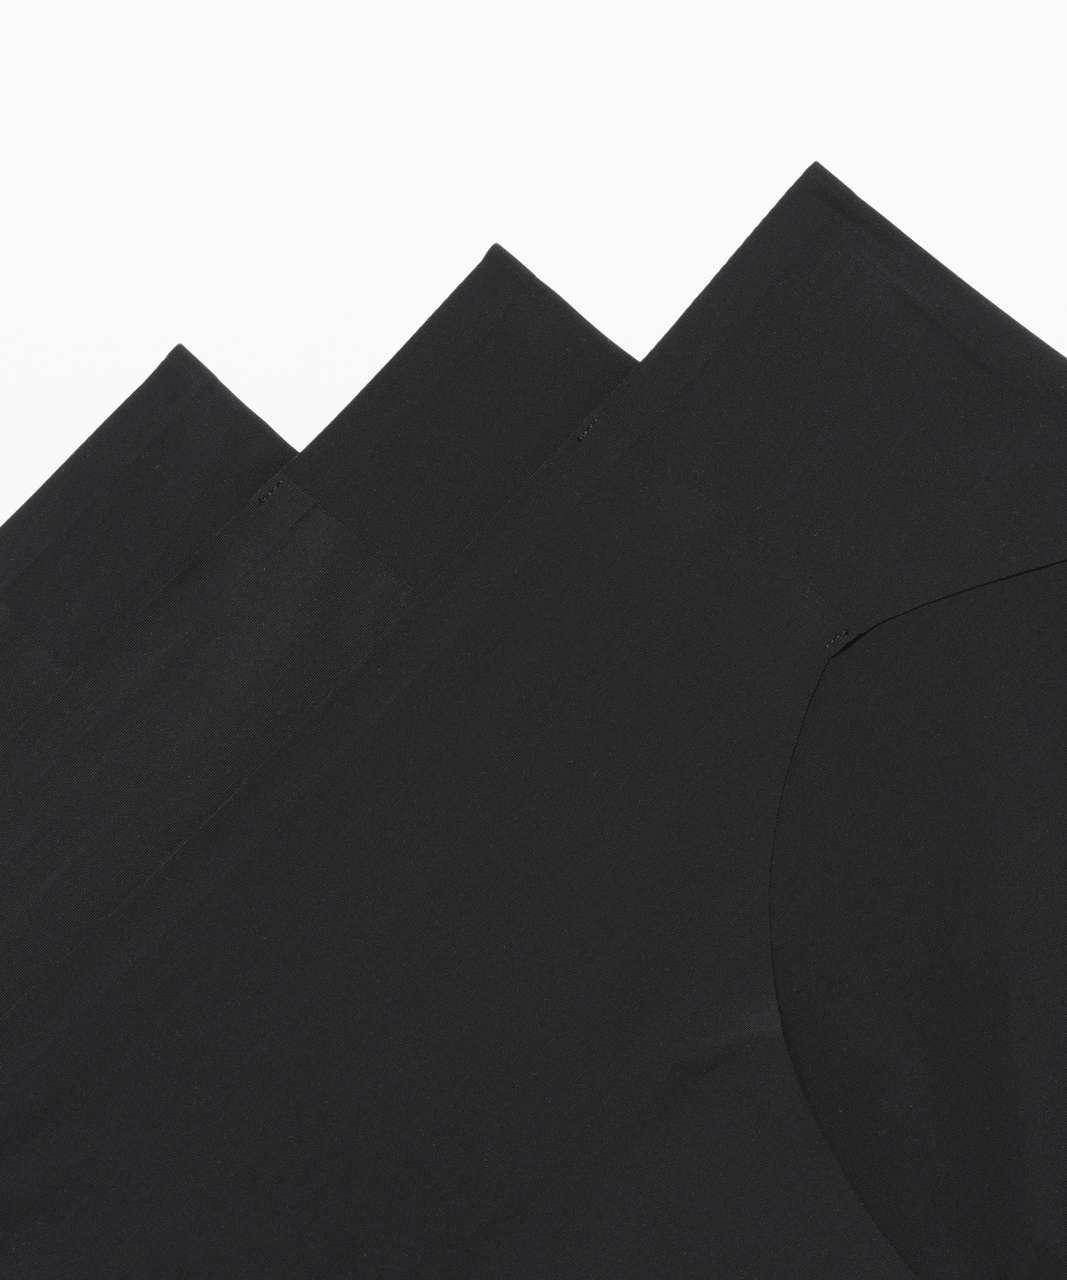 Lululemon Namastay Put Hipster 3 Pack - Black / Black / Black